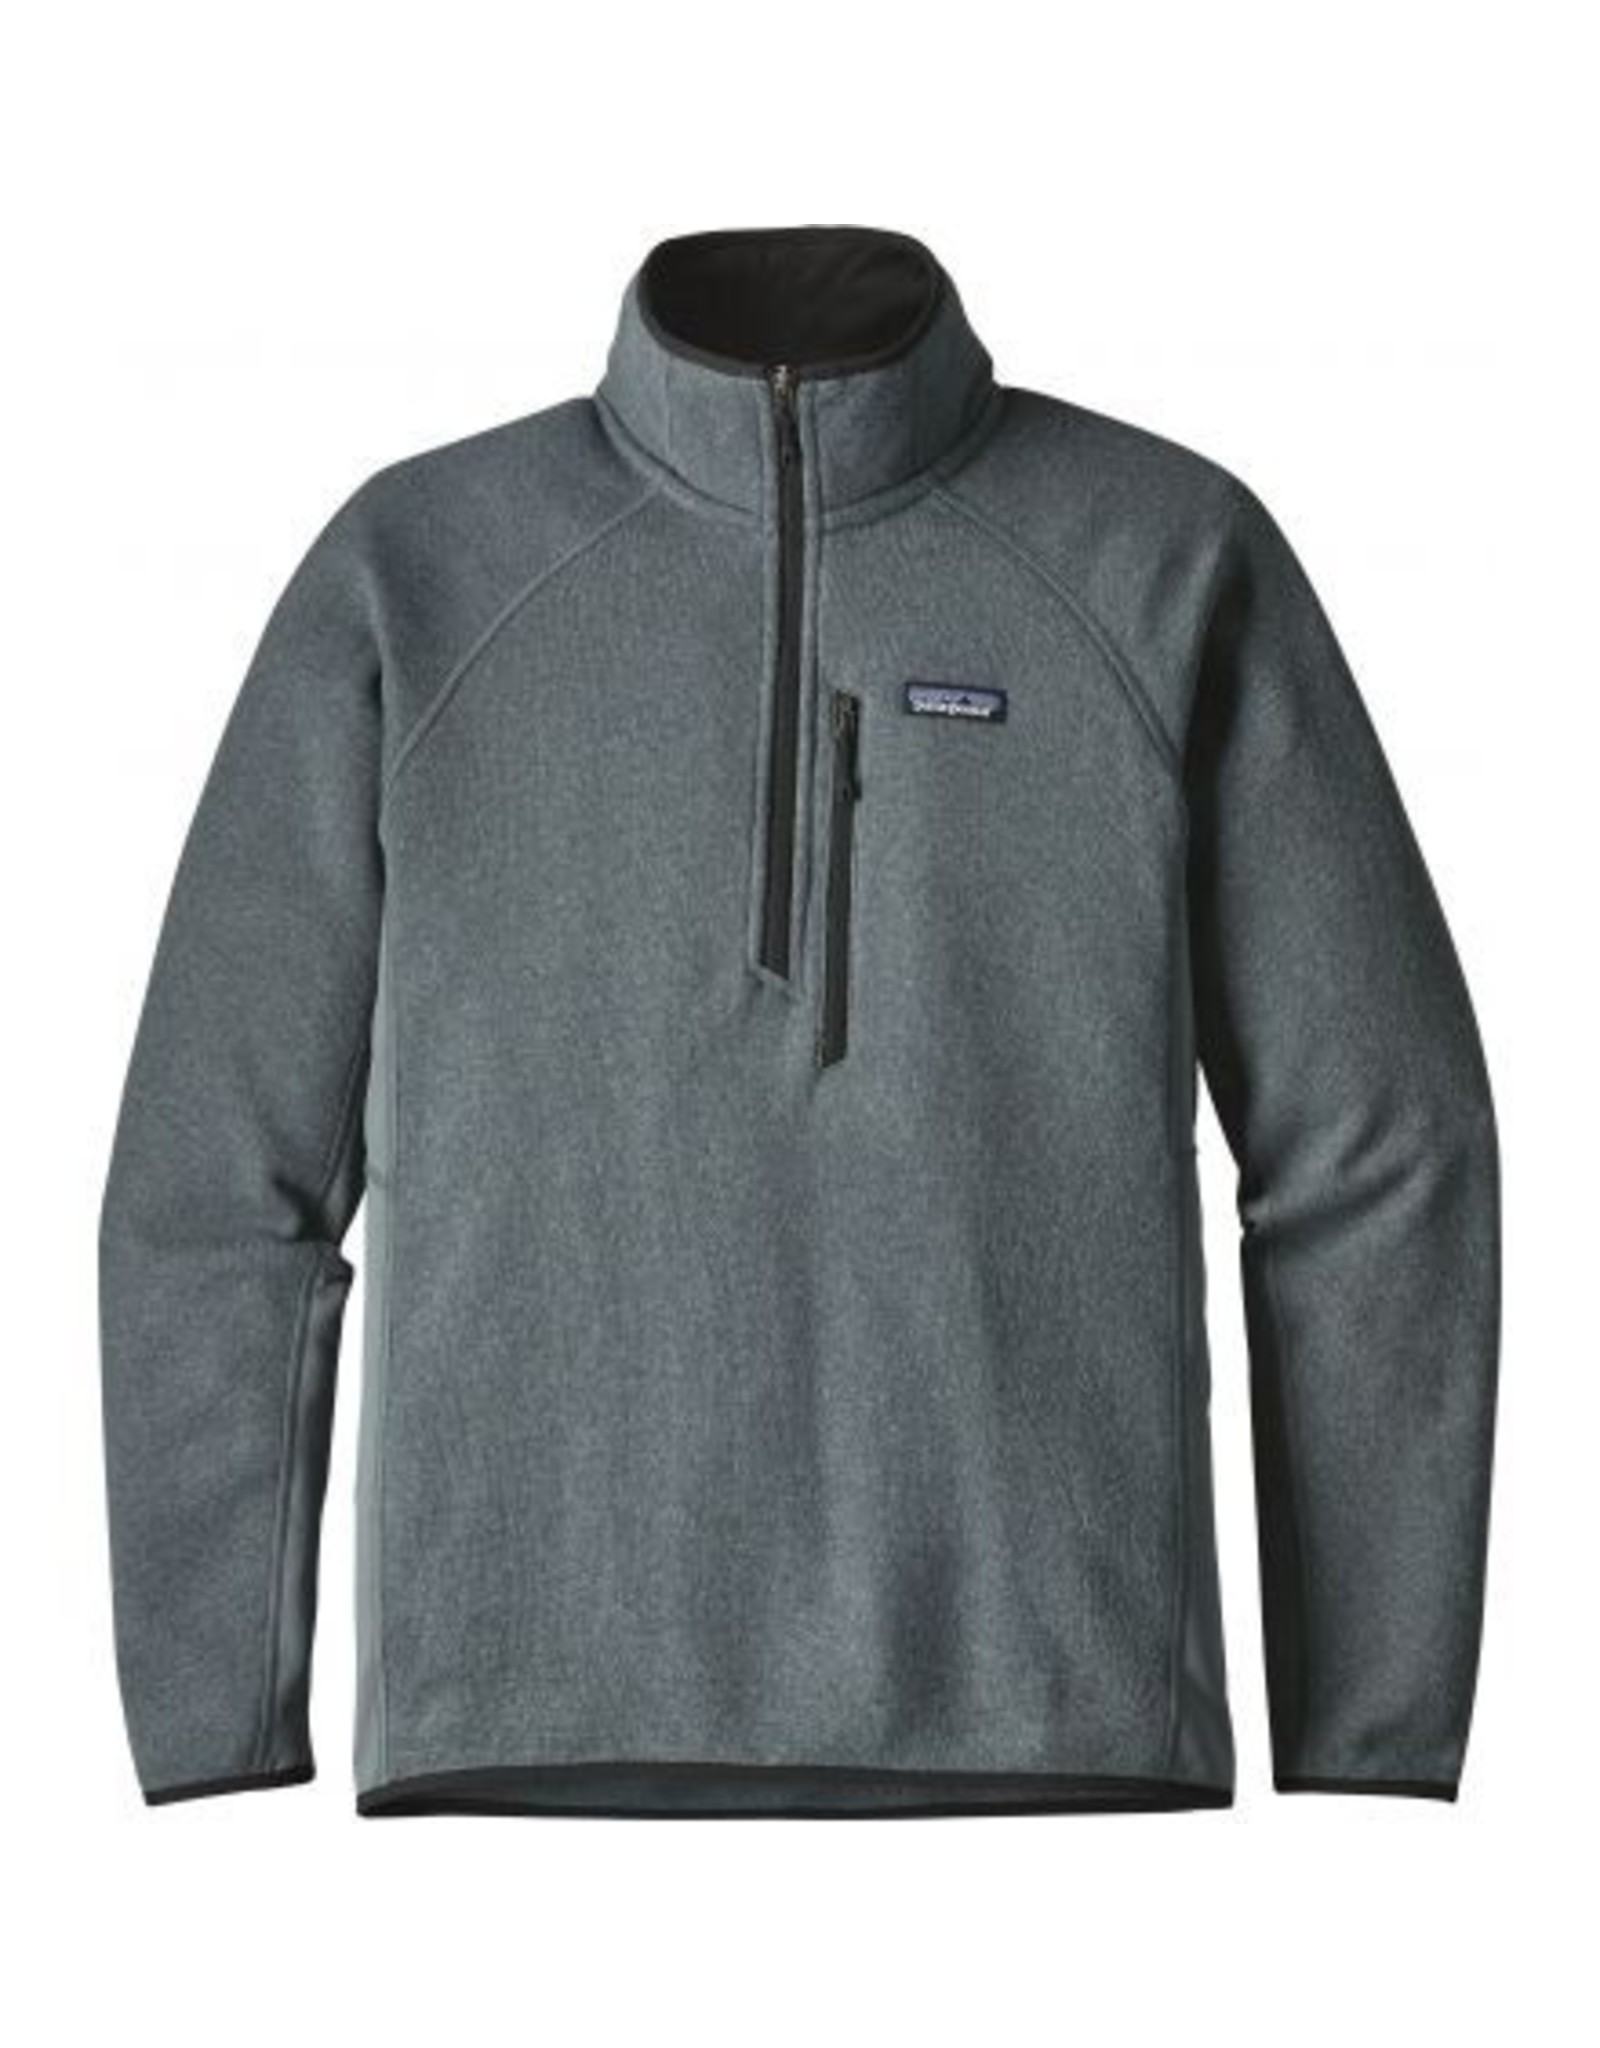 Patagonia Performance Better Sweater 1/4 Zip